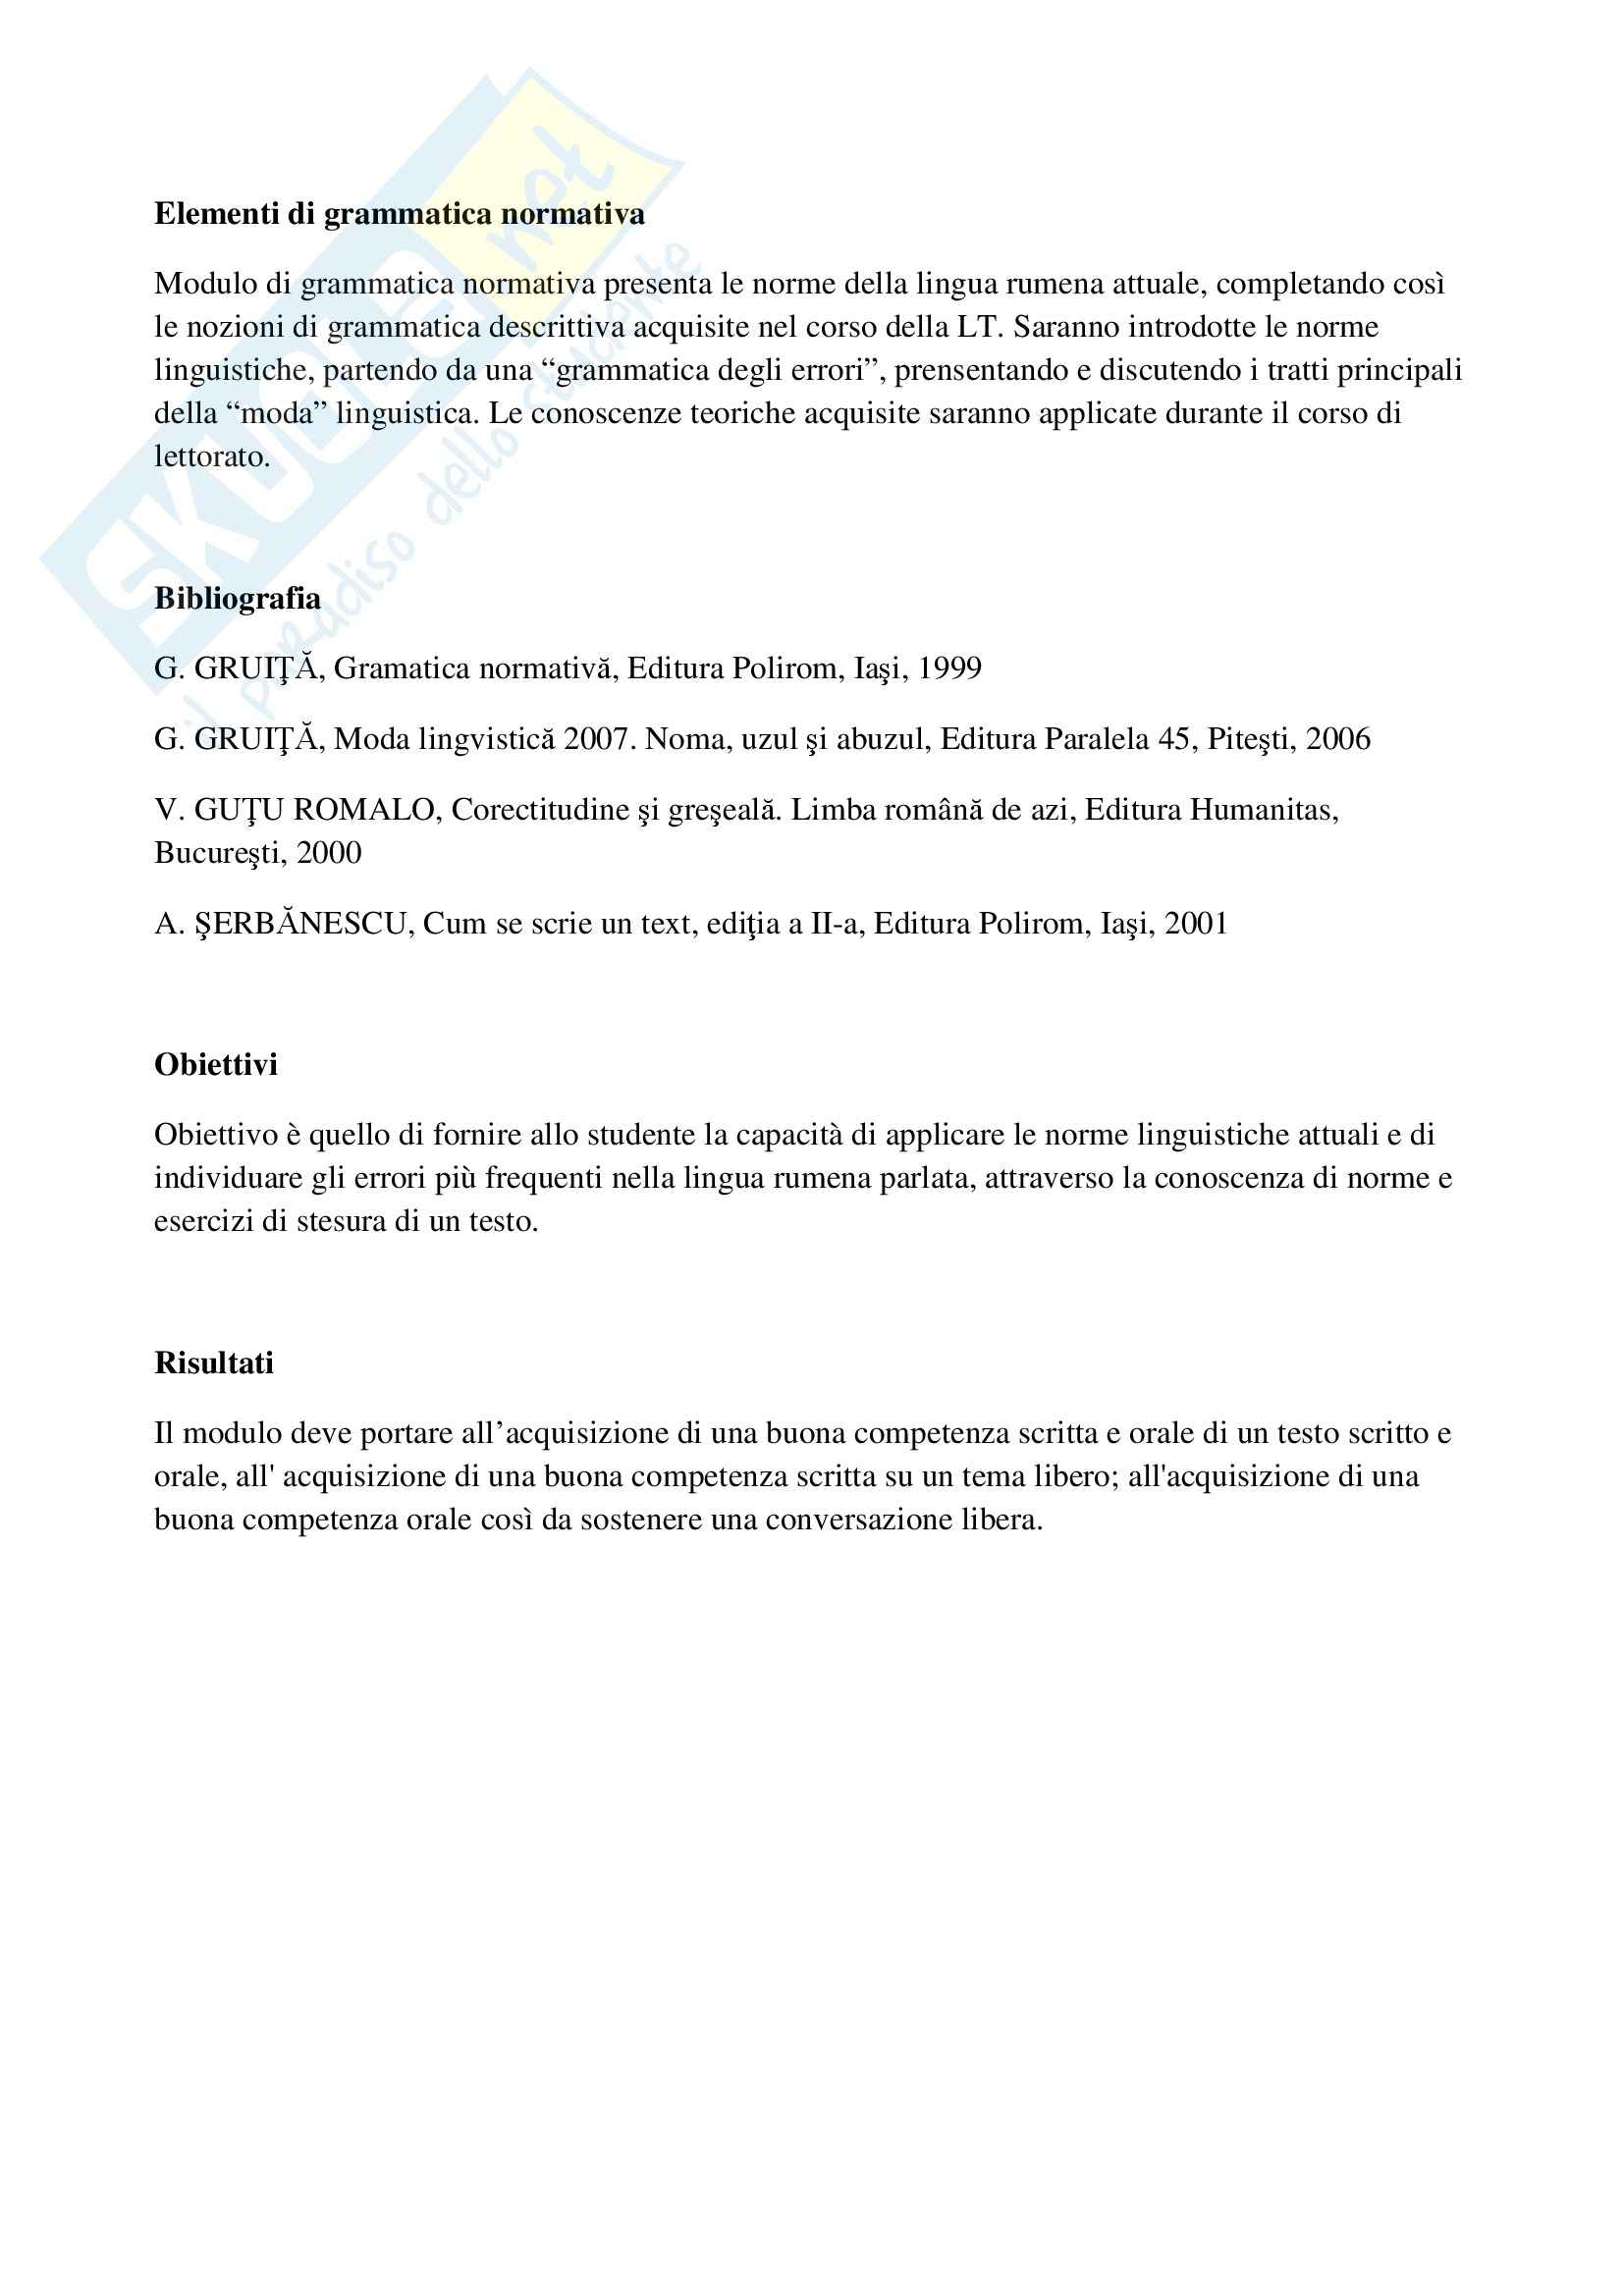 Grammatica normativa rumena - Elementi